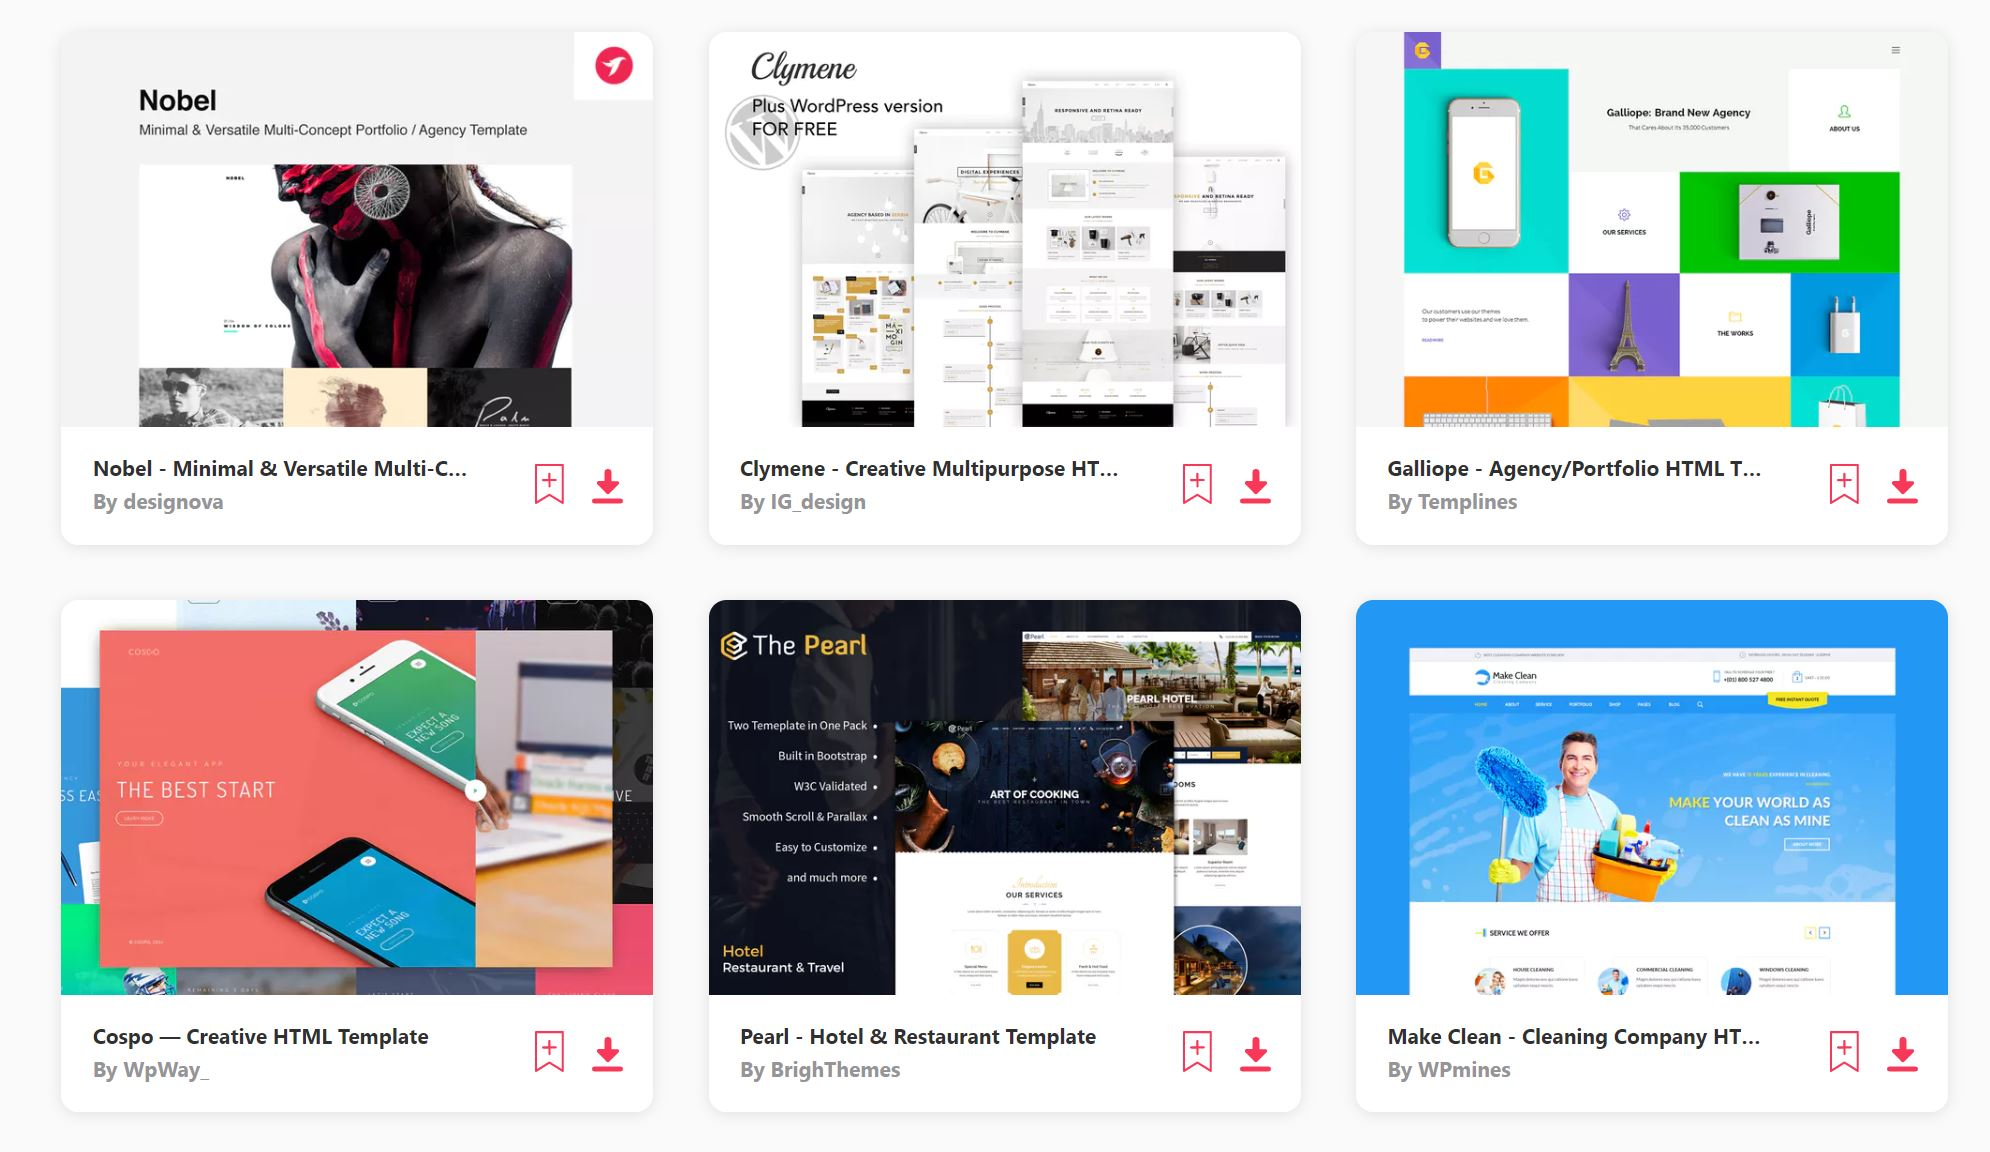 Jasa Pembuatan Aplikasi | Jual Ratusan Premium Website Template Mempercepat Pekerjaan Anda Dalam Membuat Website